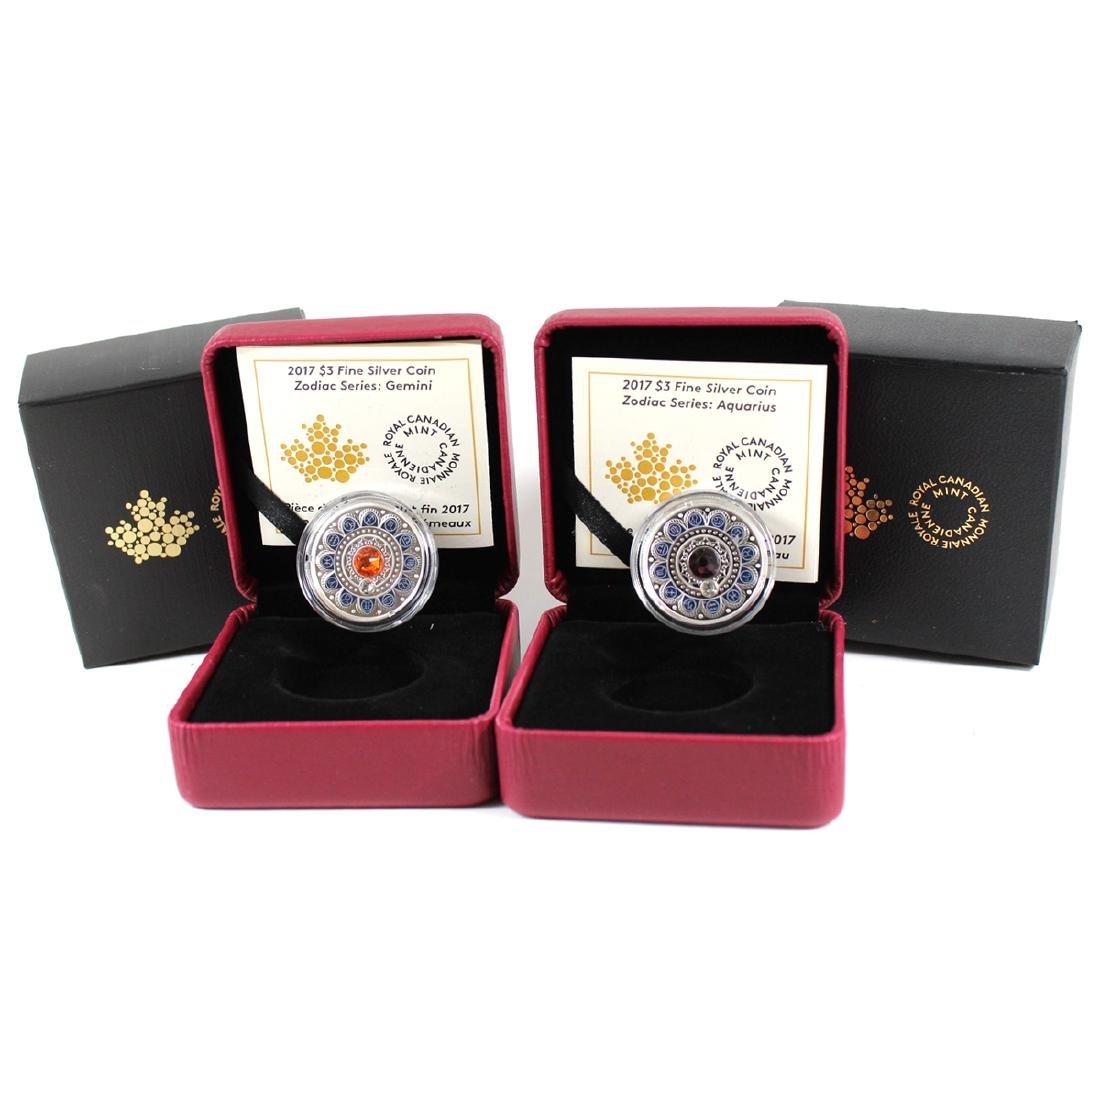 2017 Canada $3 Zodiac Series - Gemini & Aquarius Fine